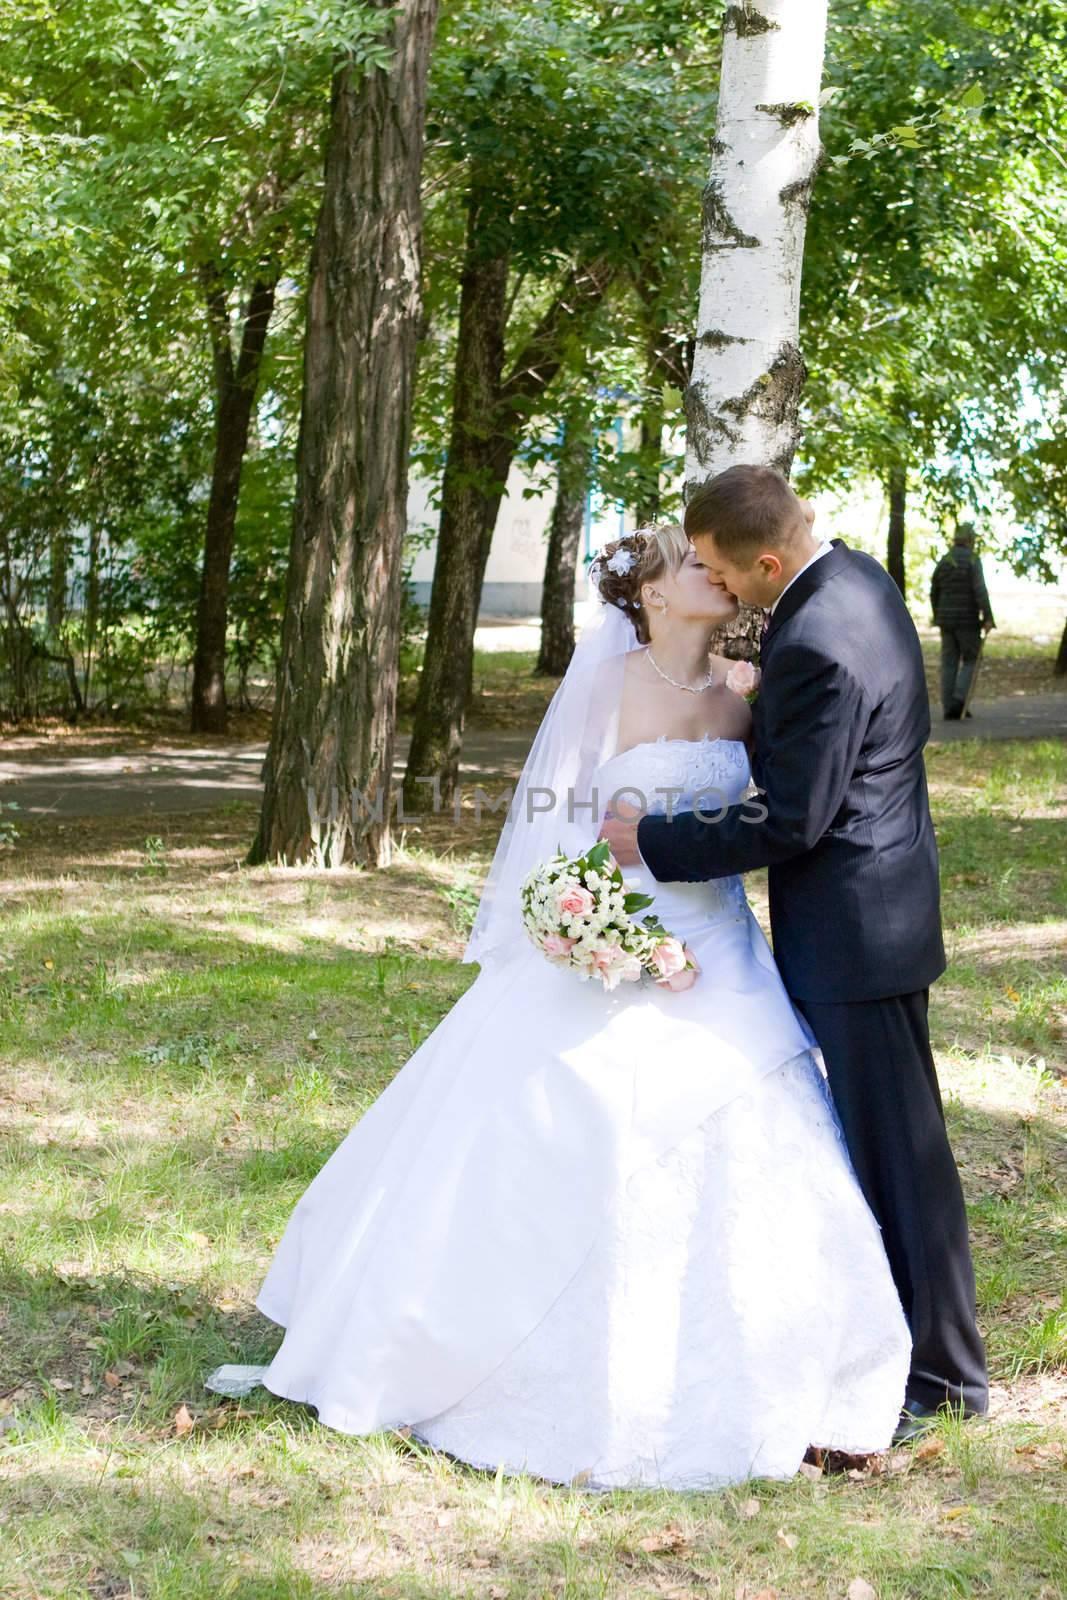 bride and groom kiss near the birch